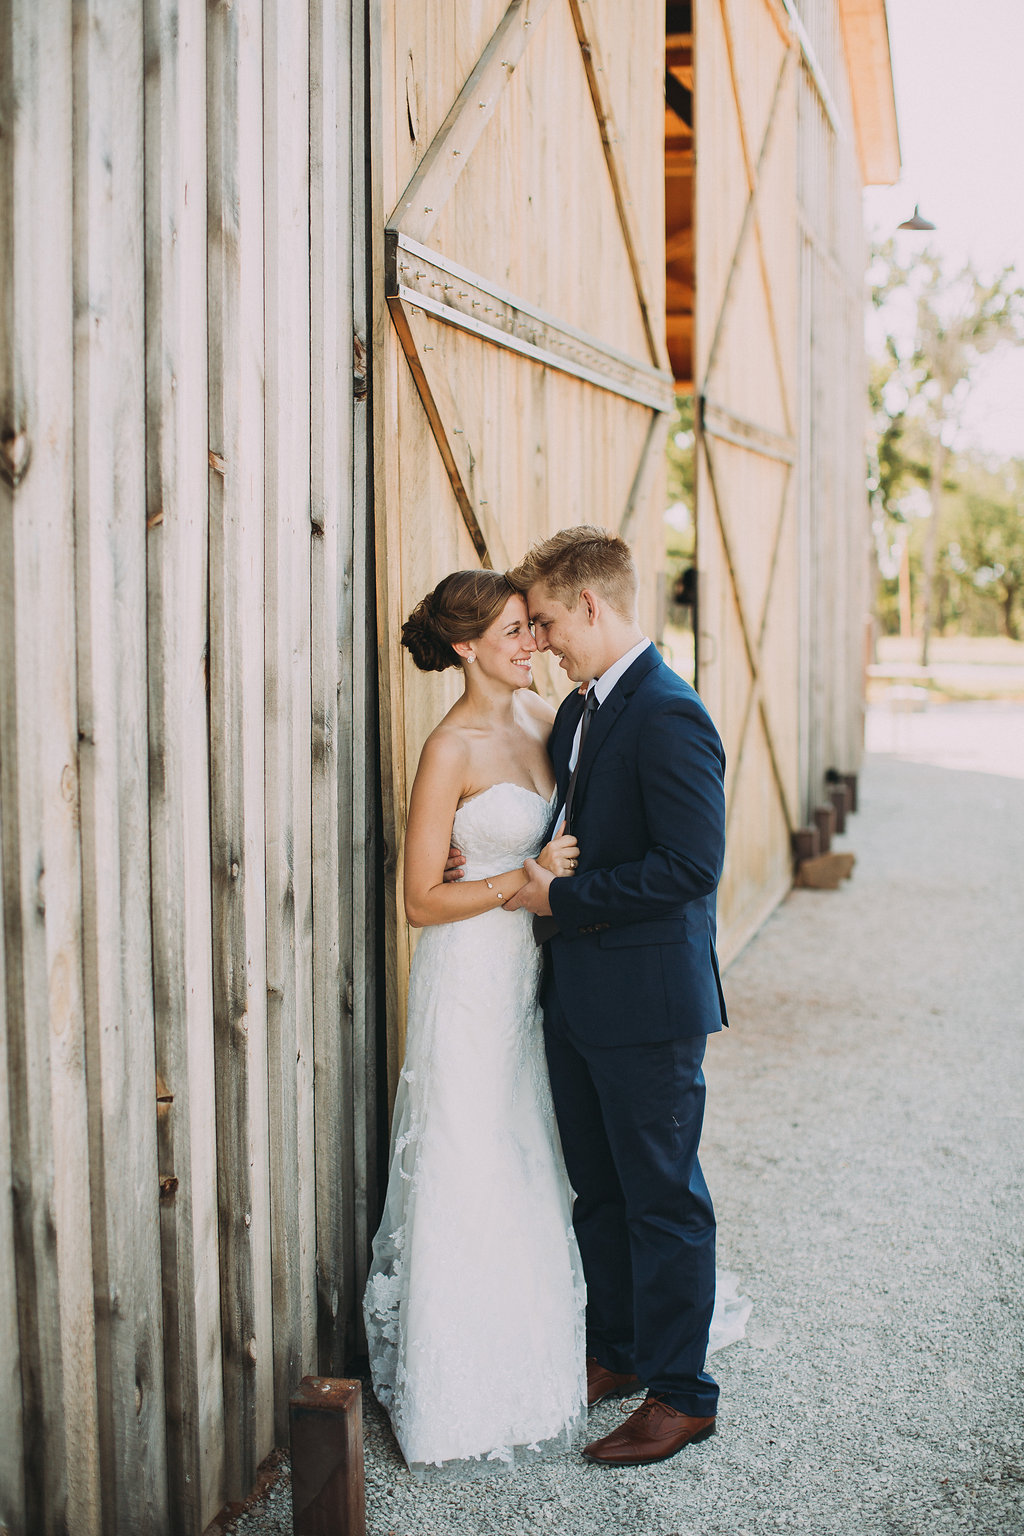 brian+annie_wedding-199.jpg